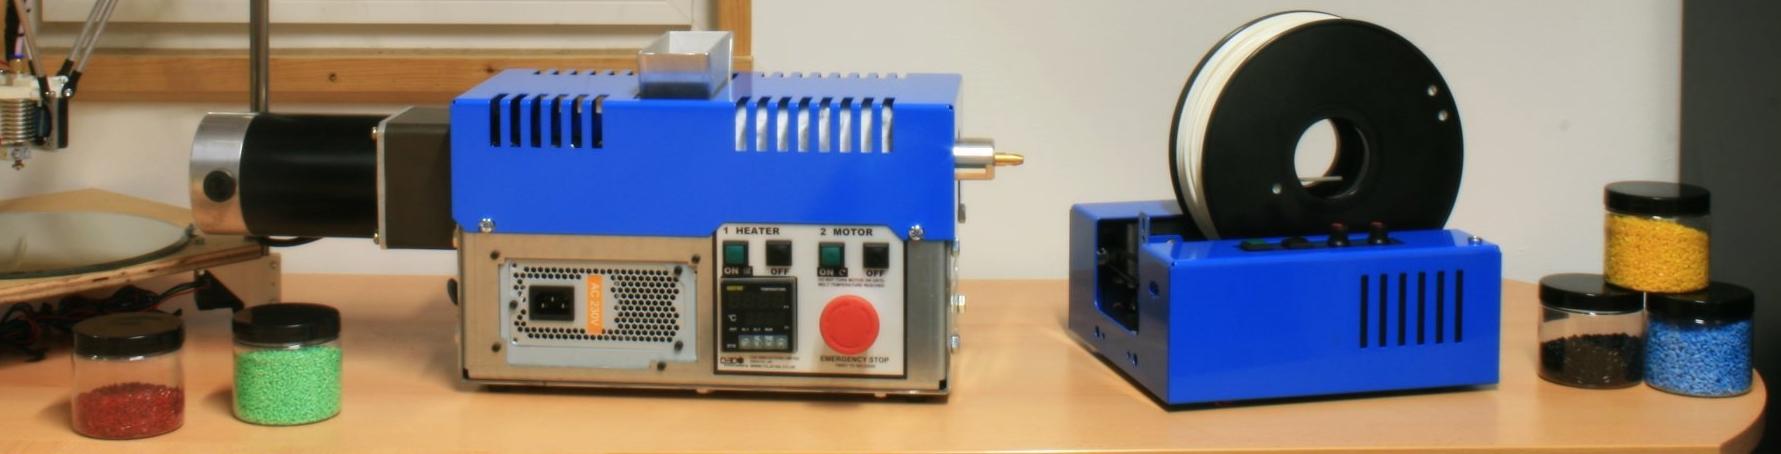 filament extruder, 3d printing extruder